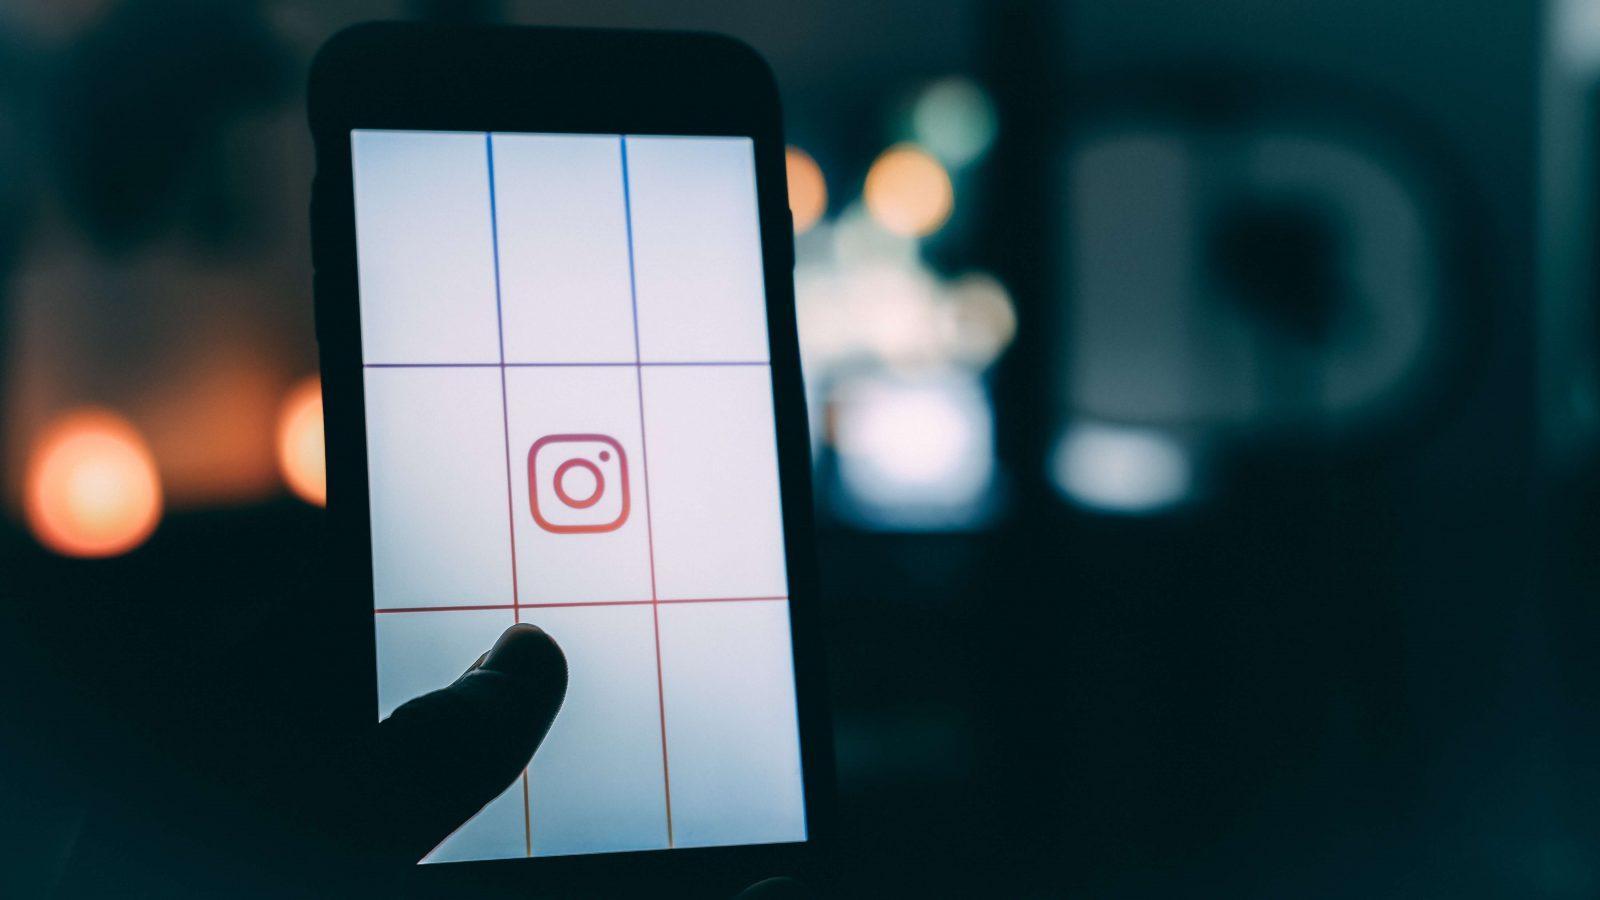 Socialmedia Profiloptimierung